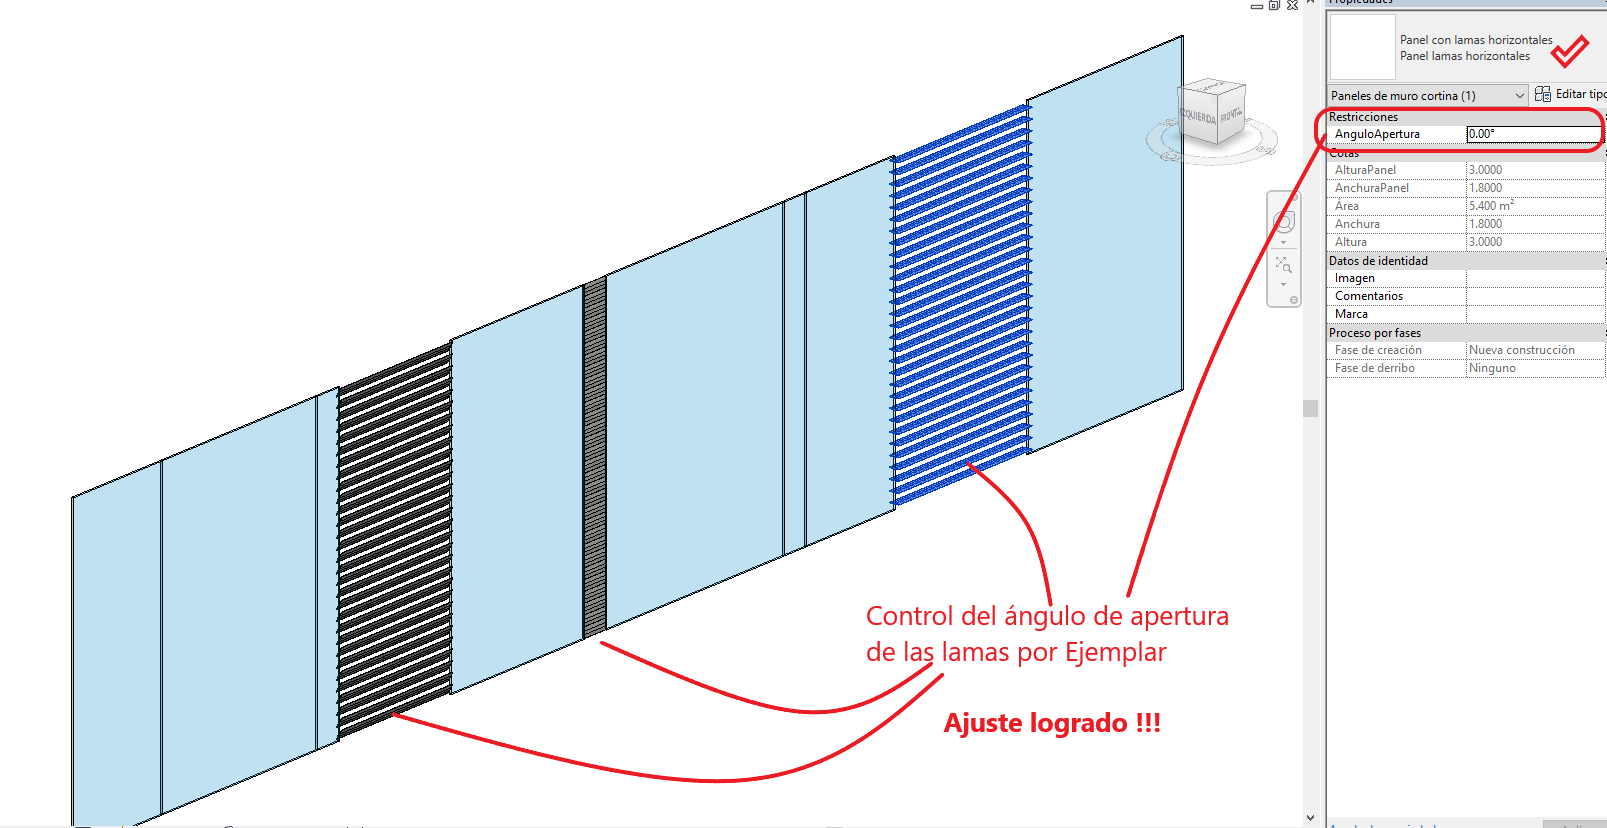 Muro cortina con paneles de lamas horizontales